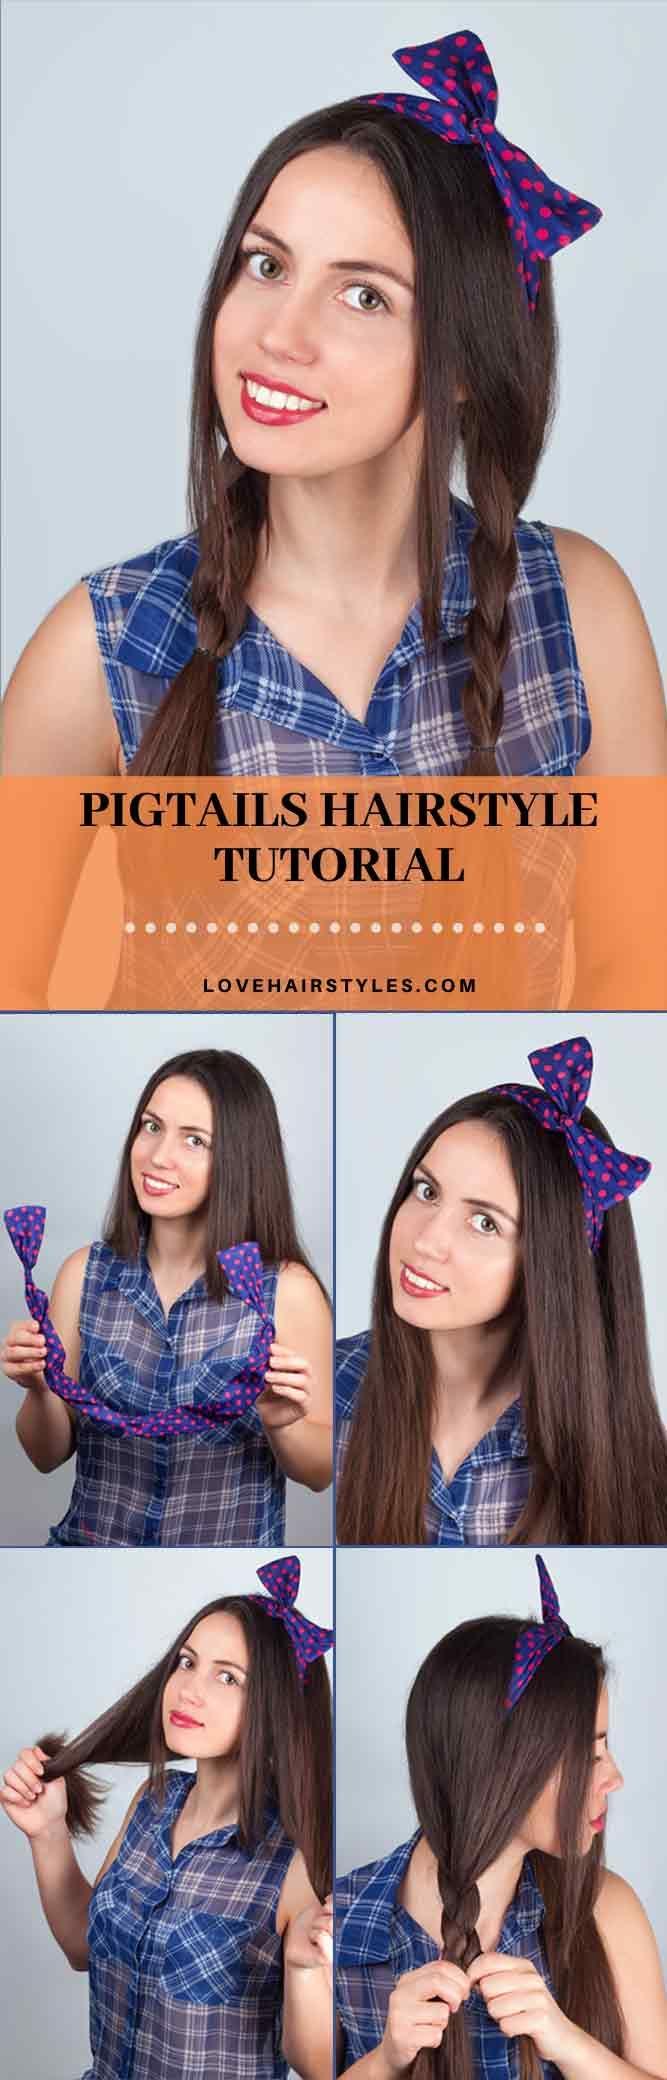 How do you make cute pigtails?